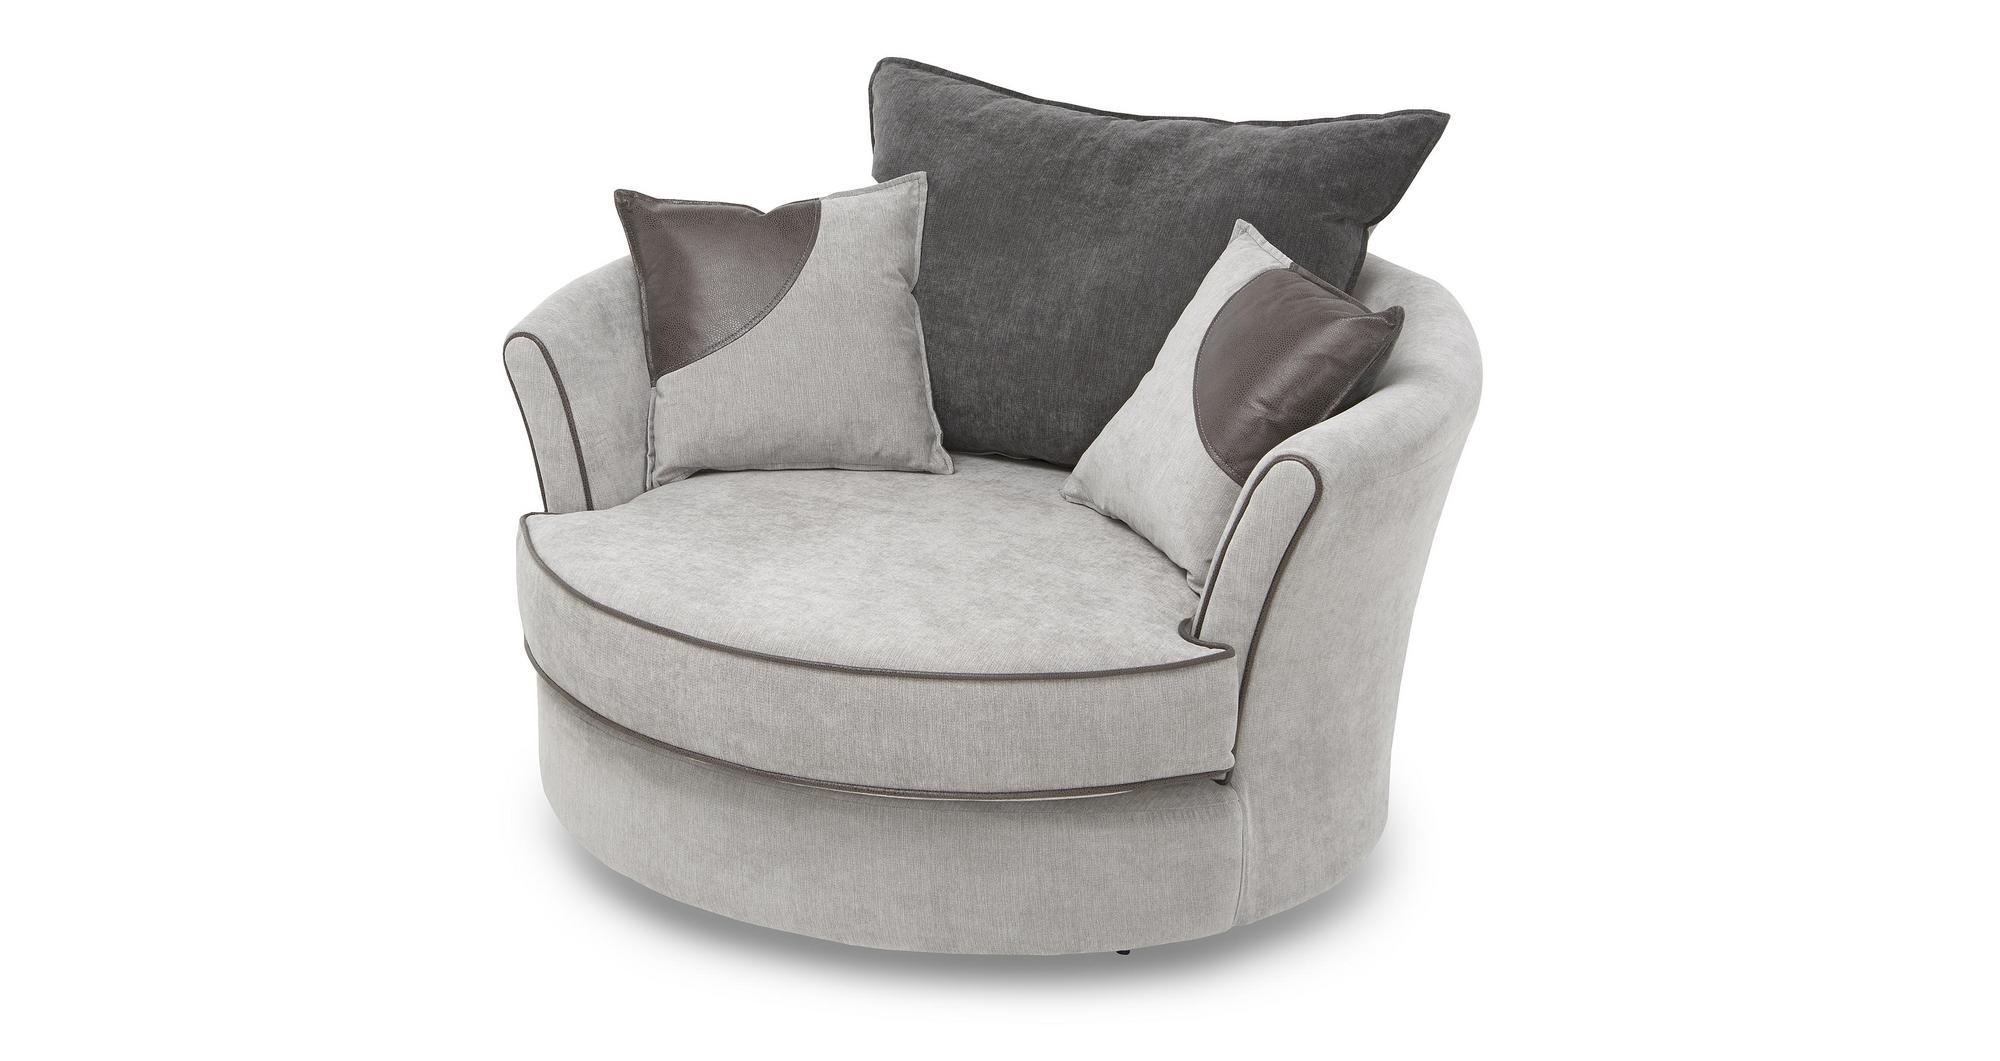 DFS Kynda Large Swivel Chair  Half Moon Footstool 58172